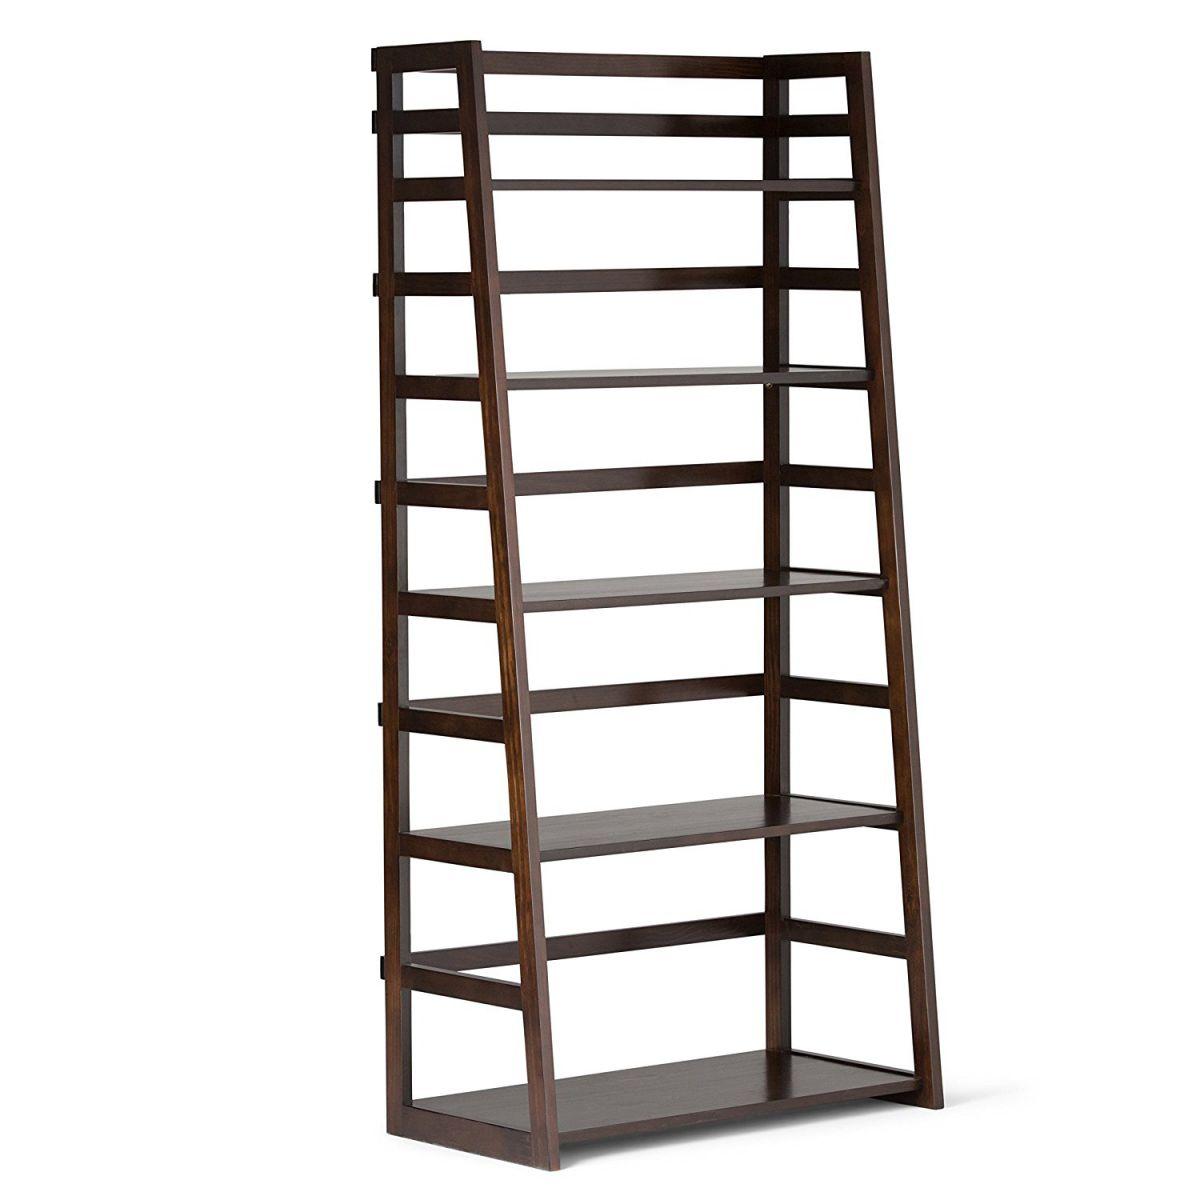 Simpli-Home-Acadian-Ladder-Shelf-Bookcase-Rich-Tobacco-Brown